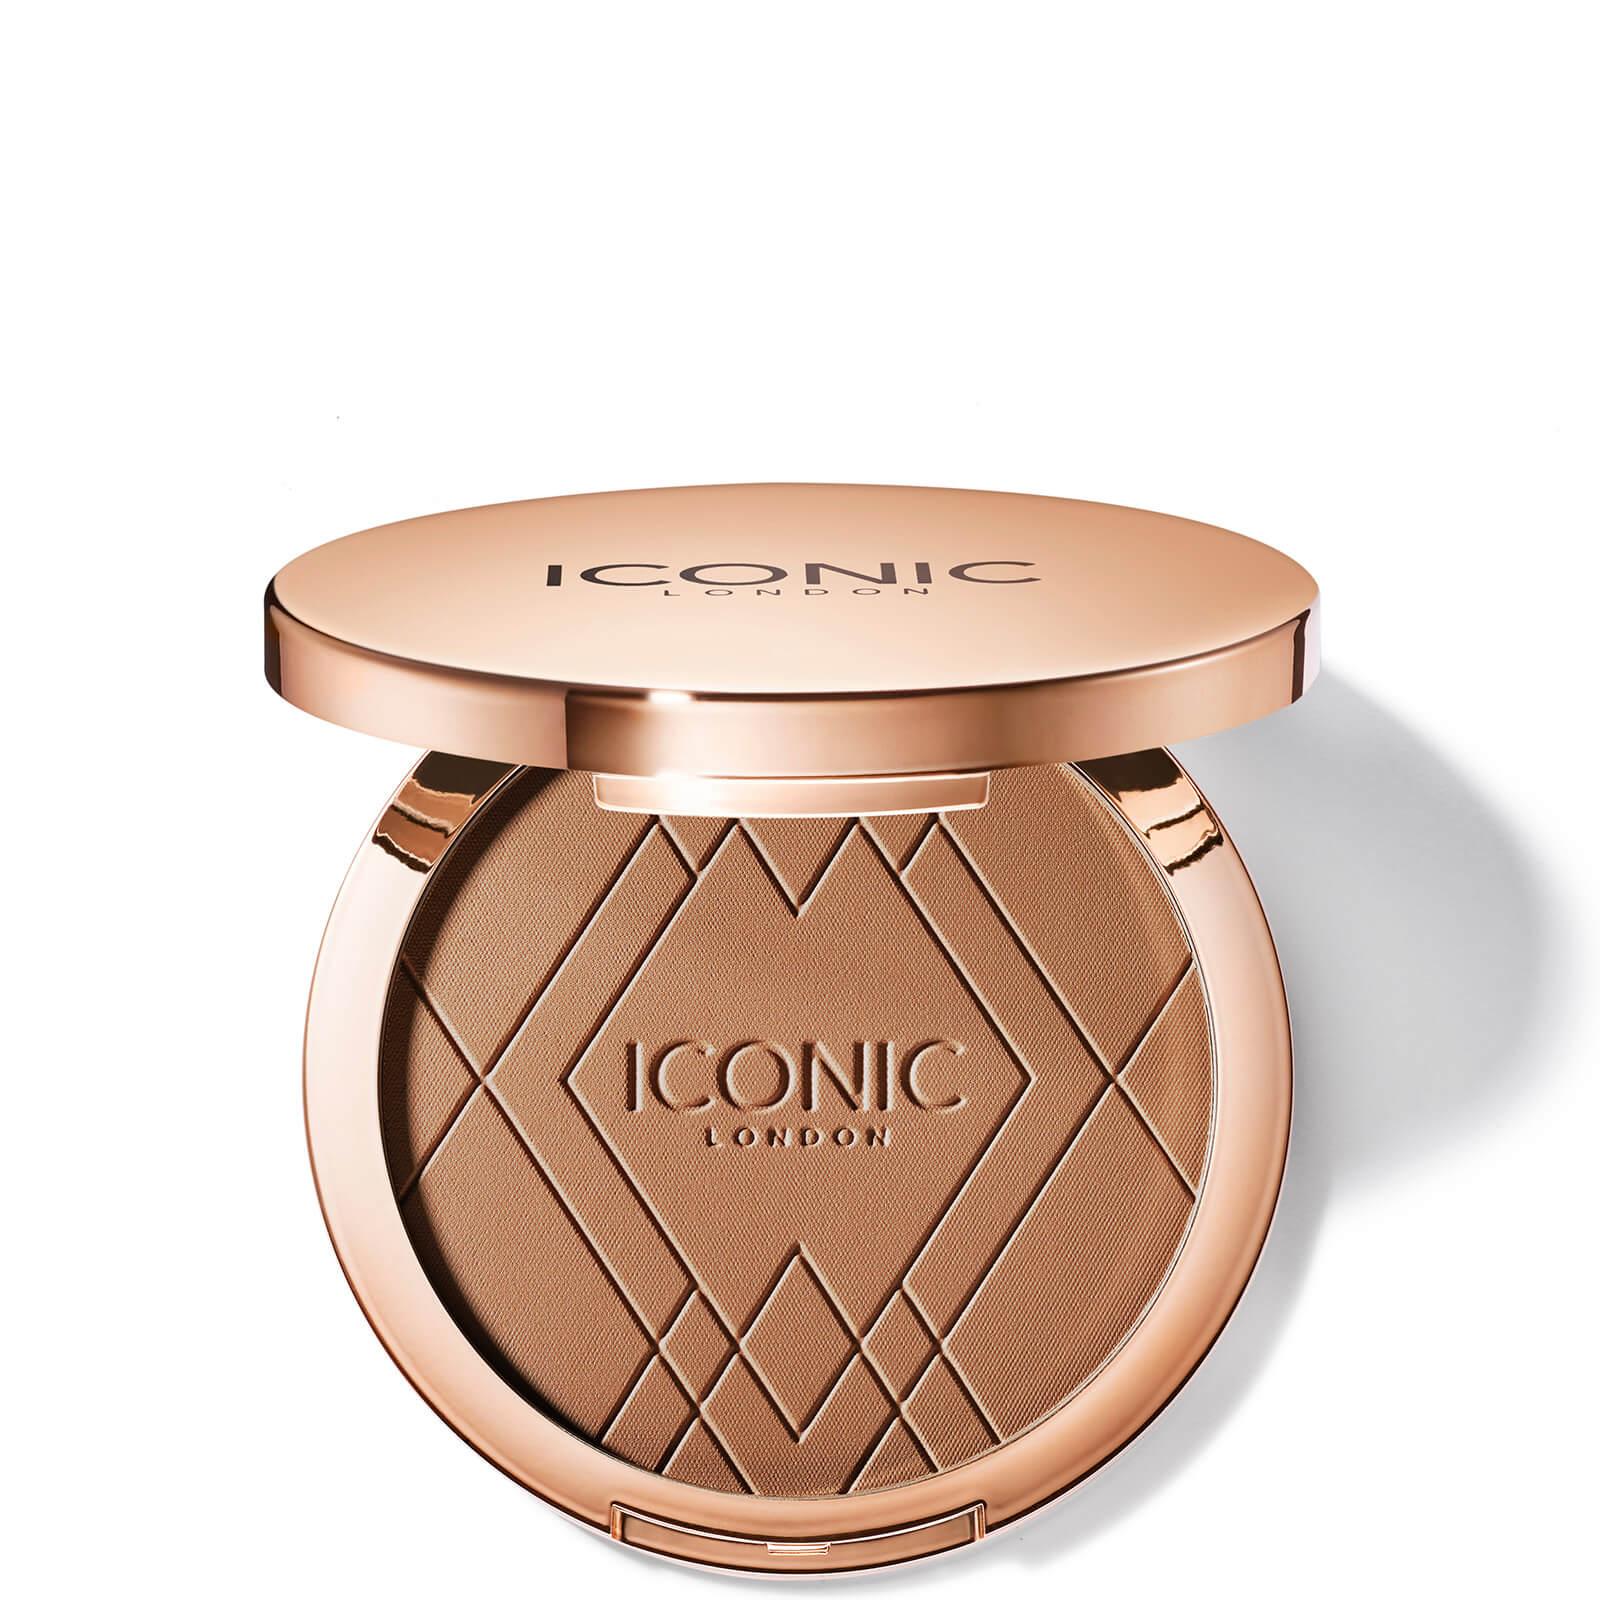 Купить ICONIC London Ultimate Bronzing Powder 17g (Various Shades) - Warm Bronze